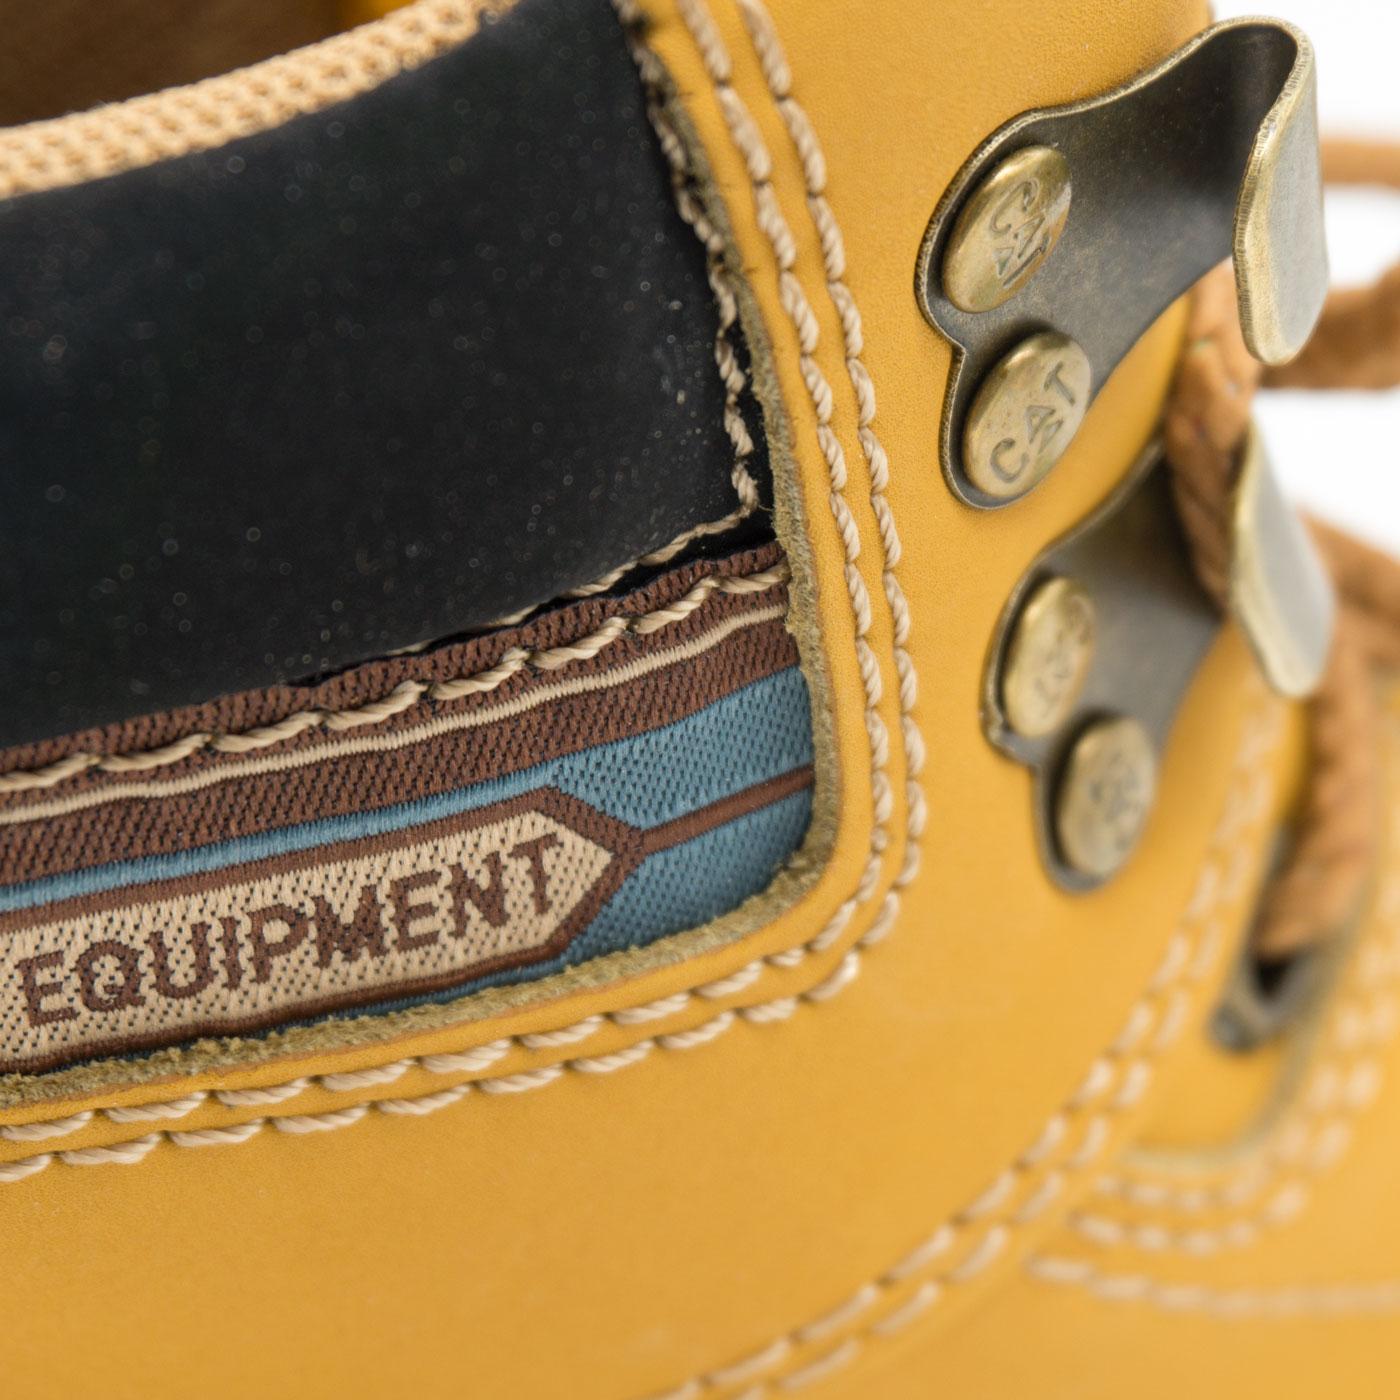 большое фото №5 Желтые женские ботинки CAT (катерпиллер)